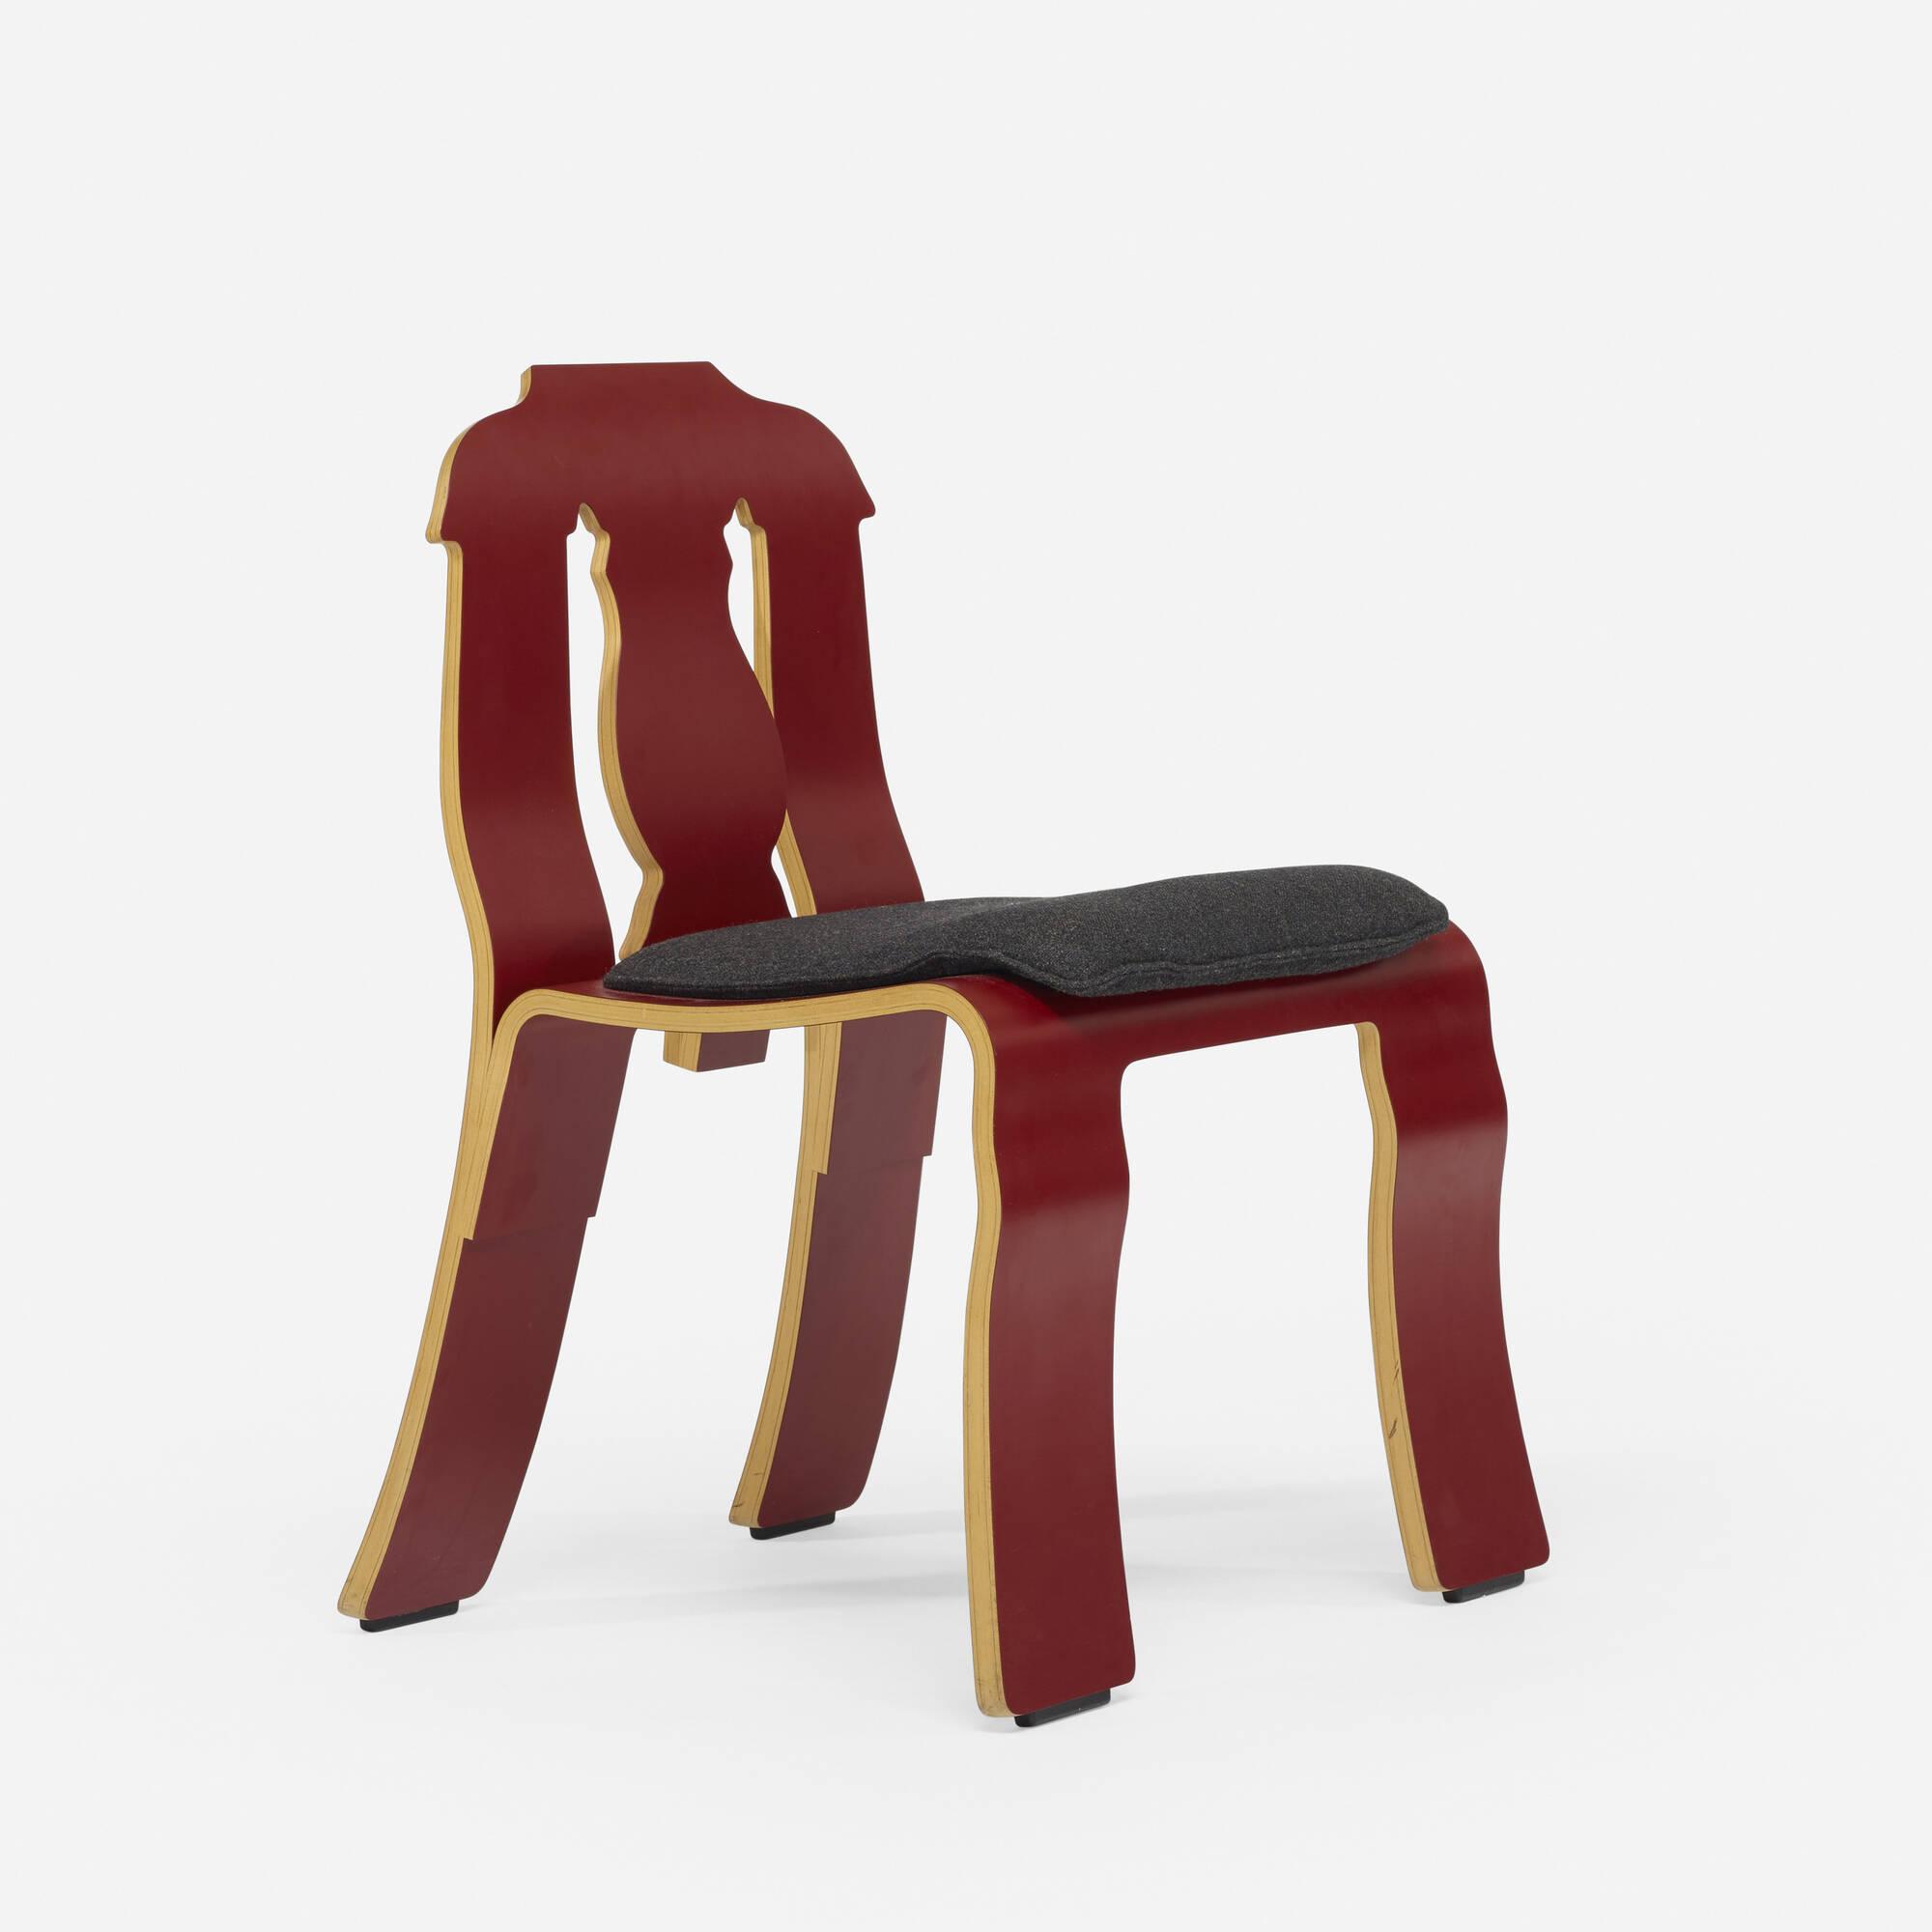 Attirant 465: Robert Venturi / Empire Chair (1 Of 4)